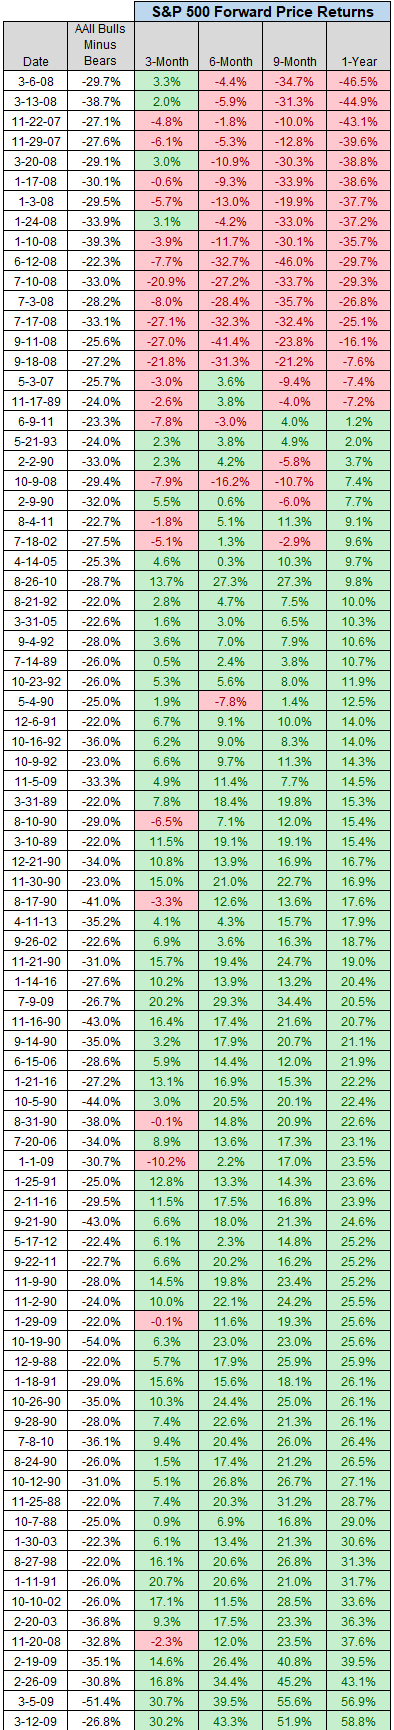 Bottom 5% of AAII Bulls-Bears Readings and S&P 500 Forward Price Returns chart5